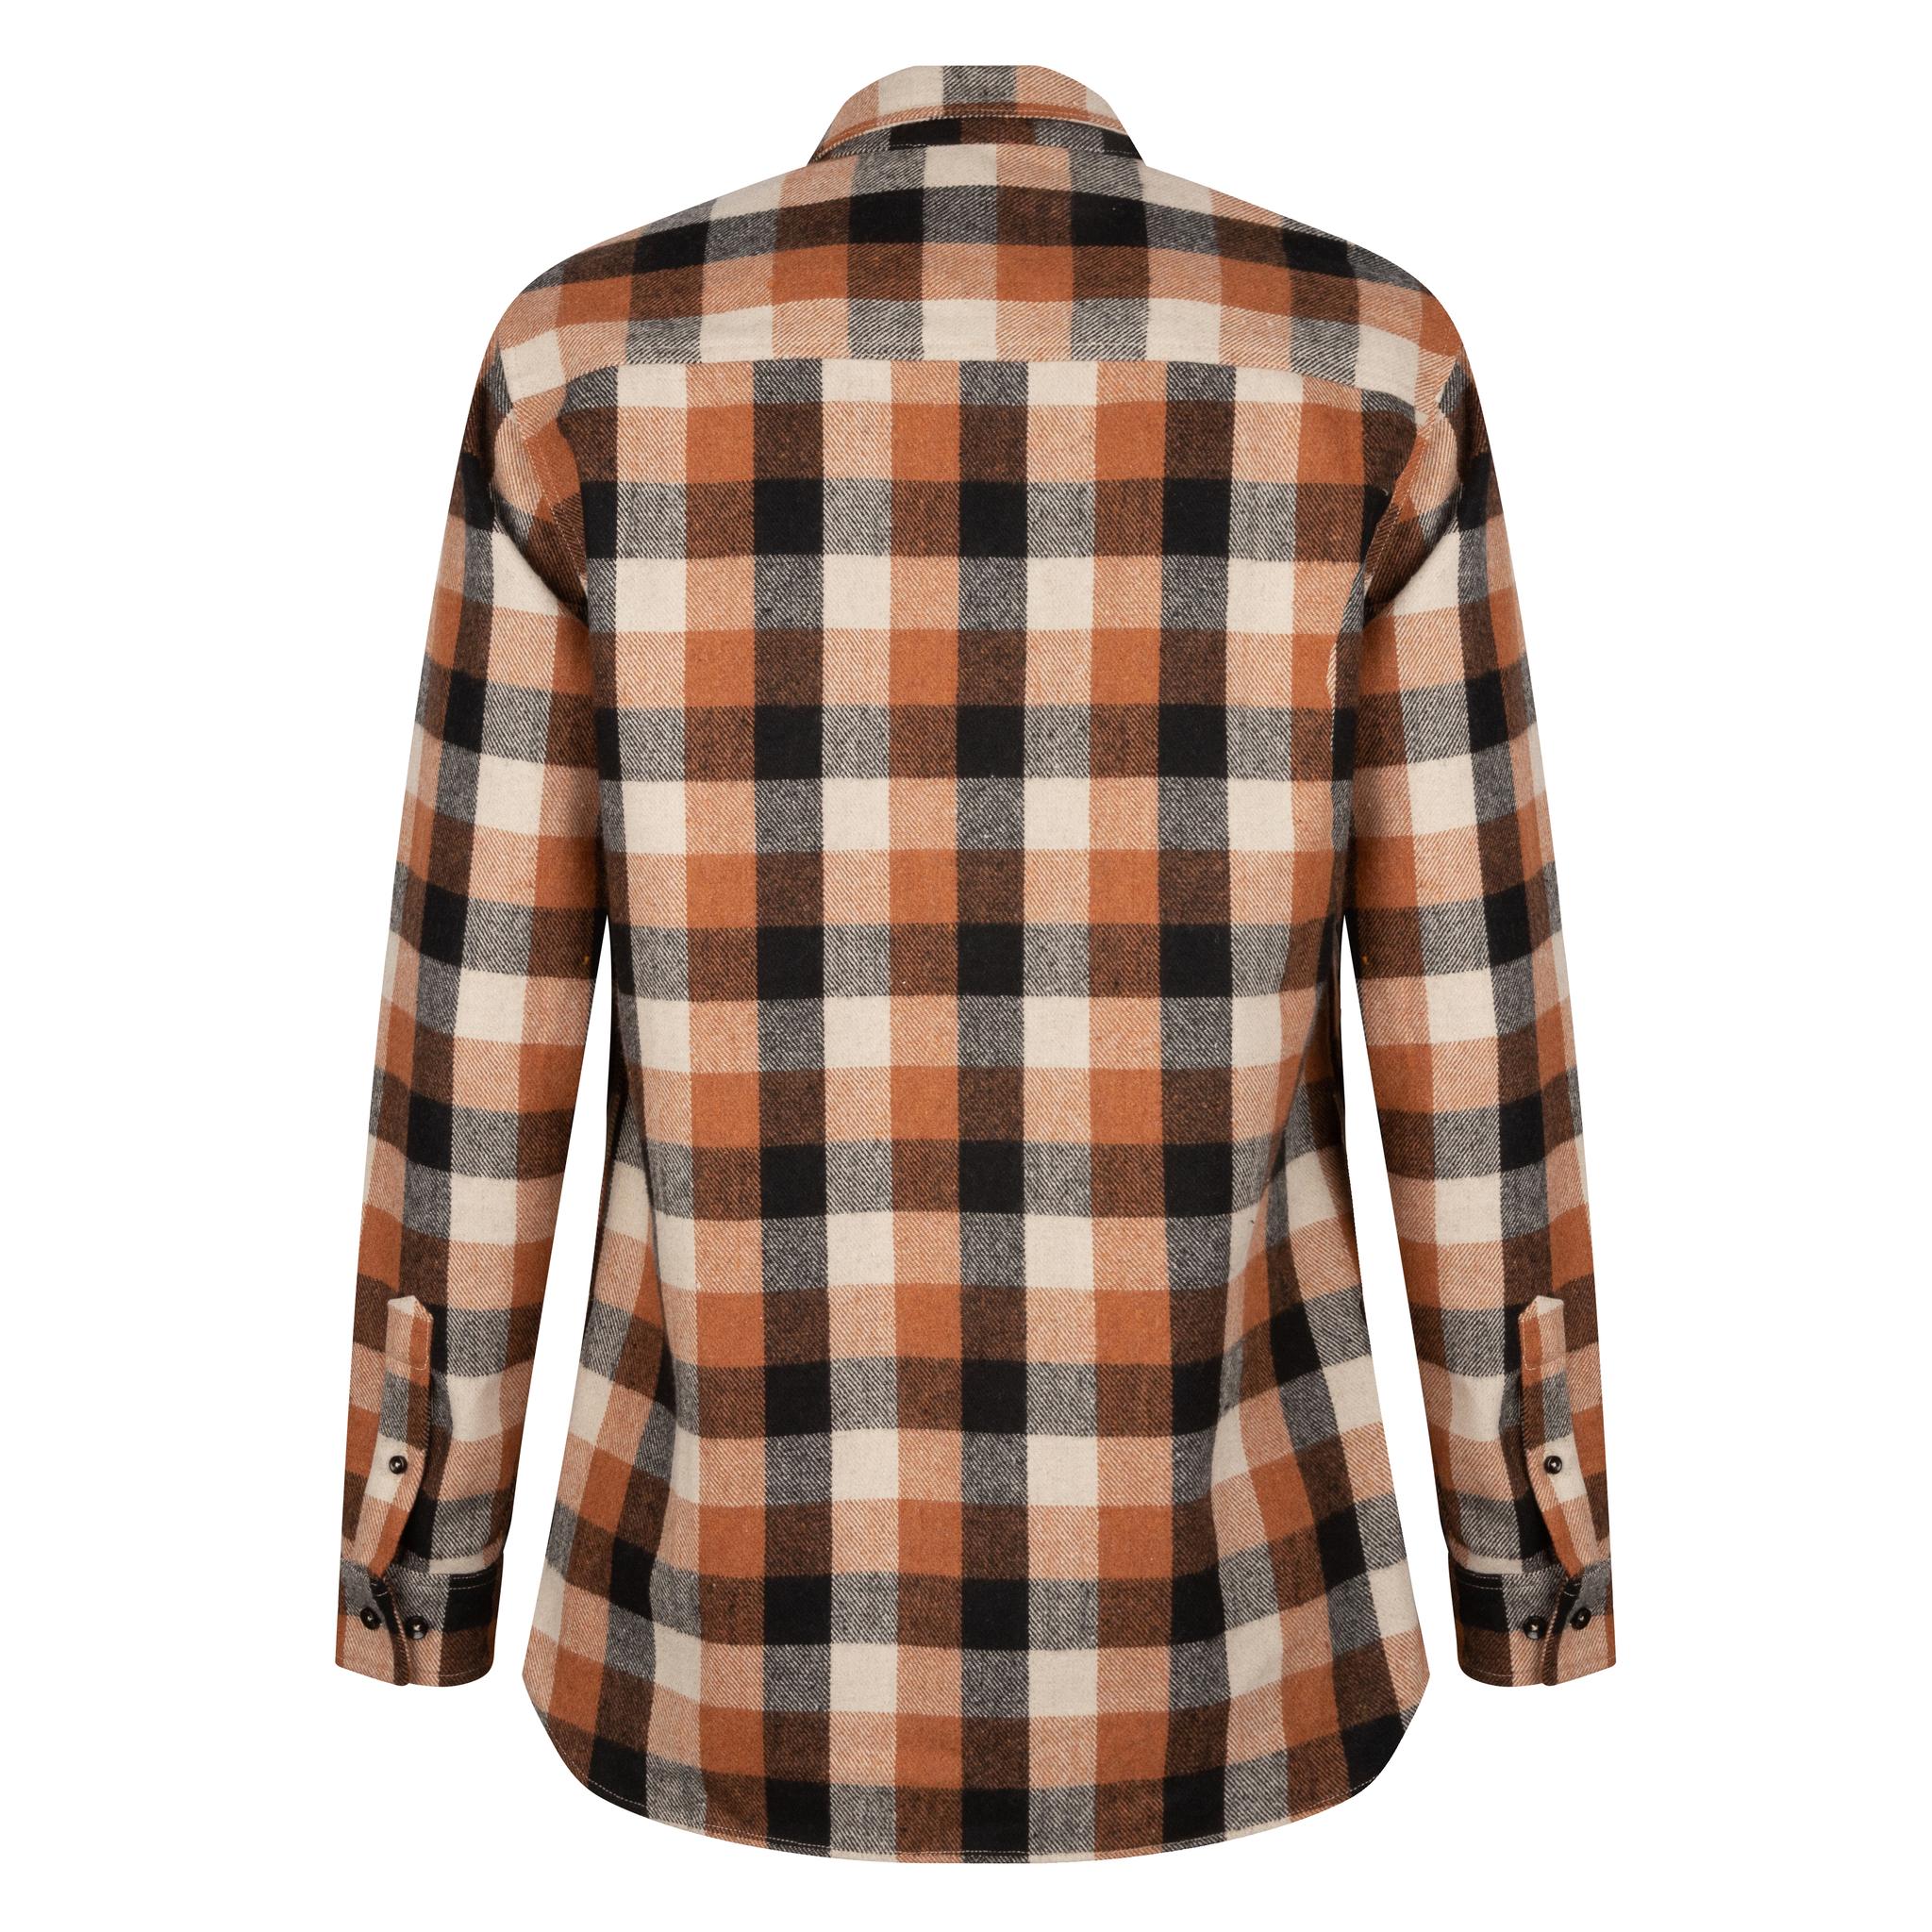 Lofty Manner Orange-black Blouse Maximo